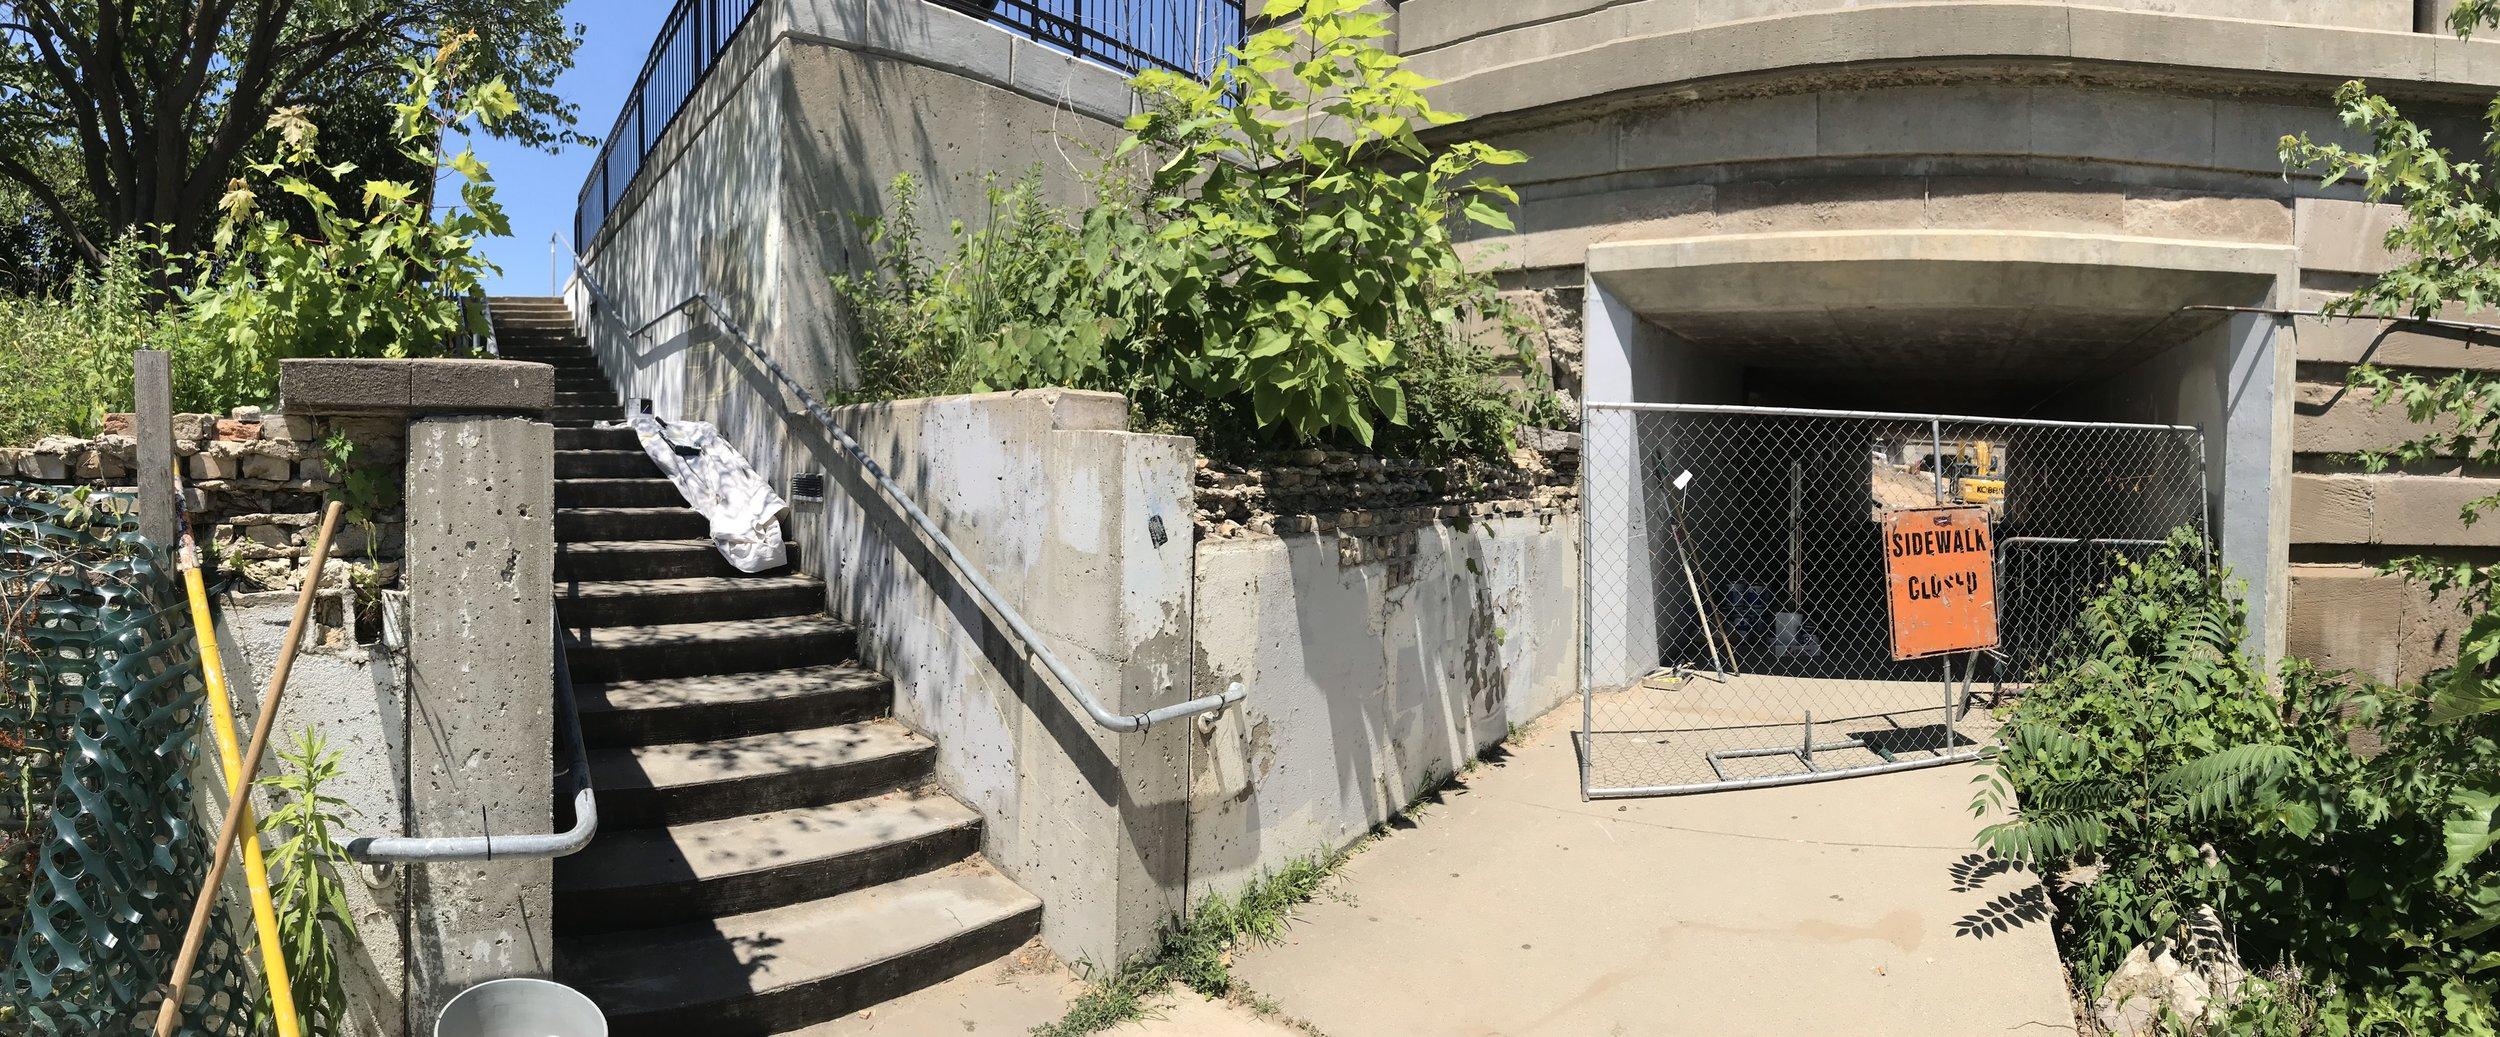 Pearl St. Bridge tunnel before intervention